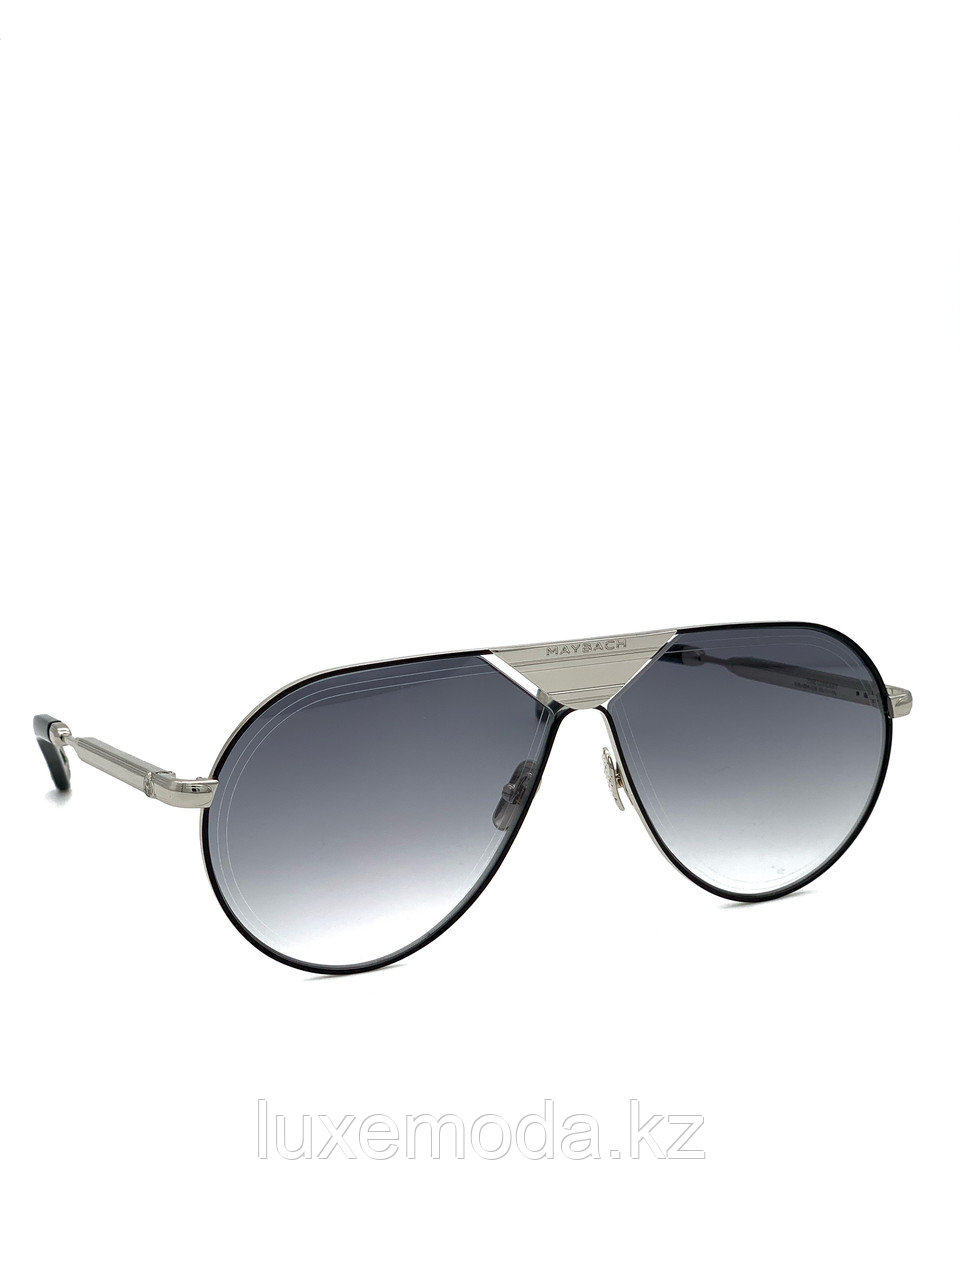 Очки Maybach Grey